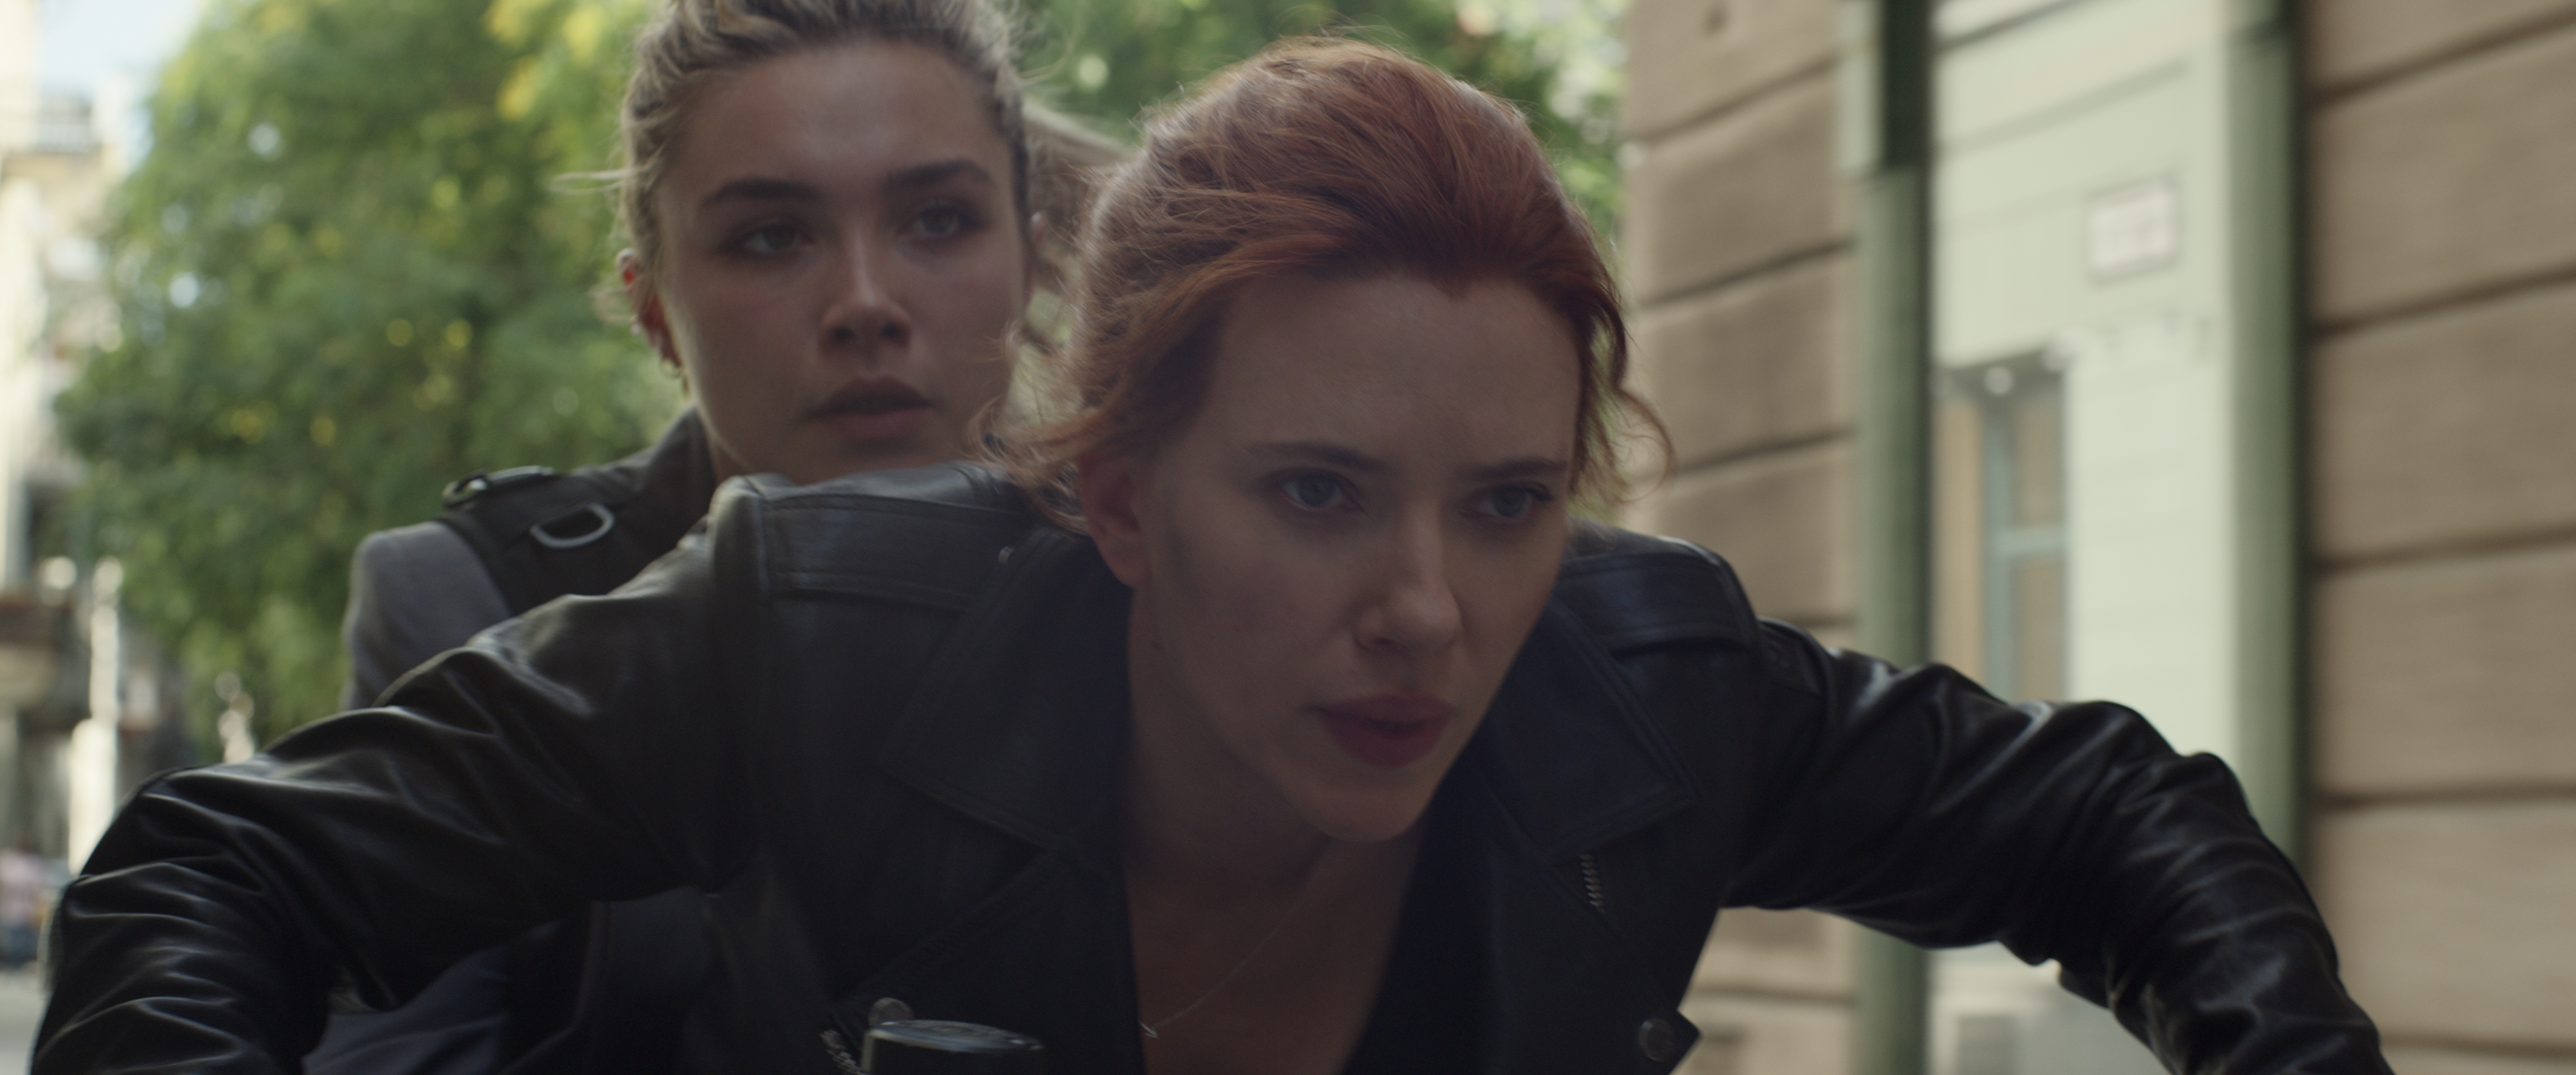 Scarlett Johansson and Florence Pugh in Black Widow (2021)